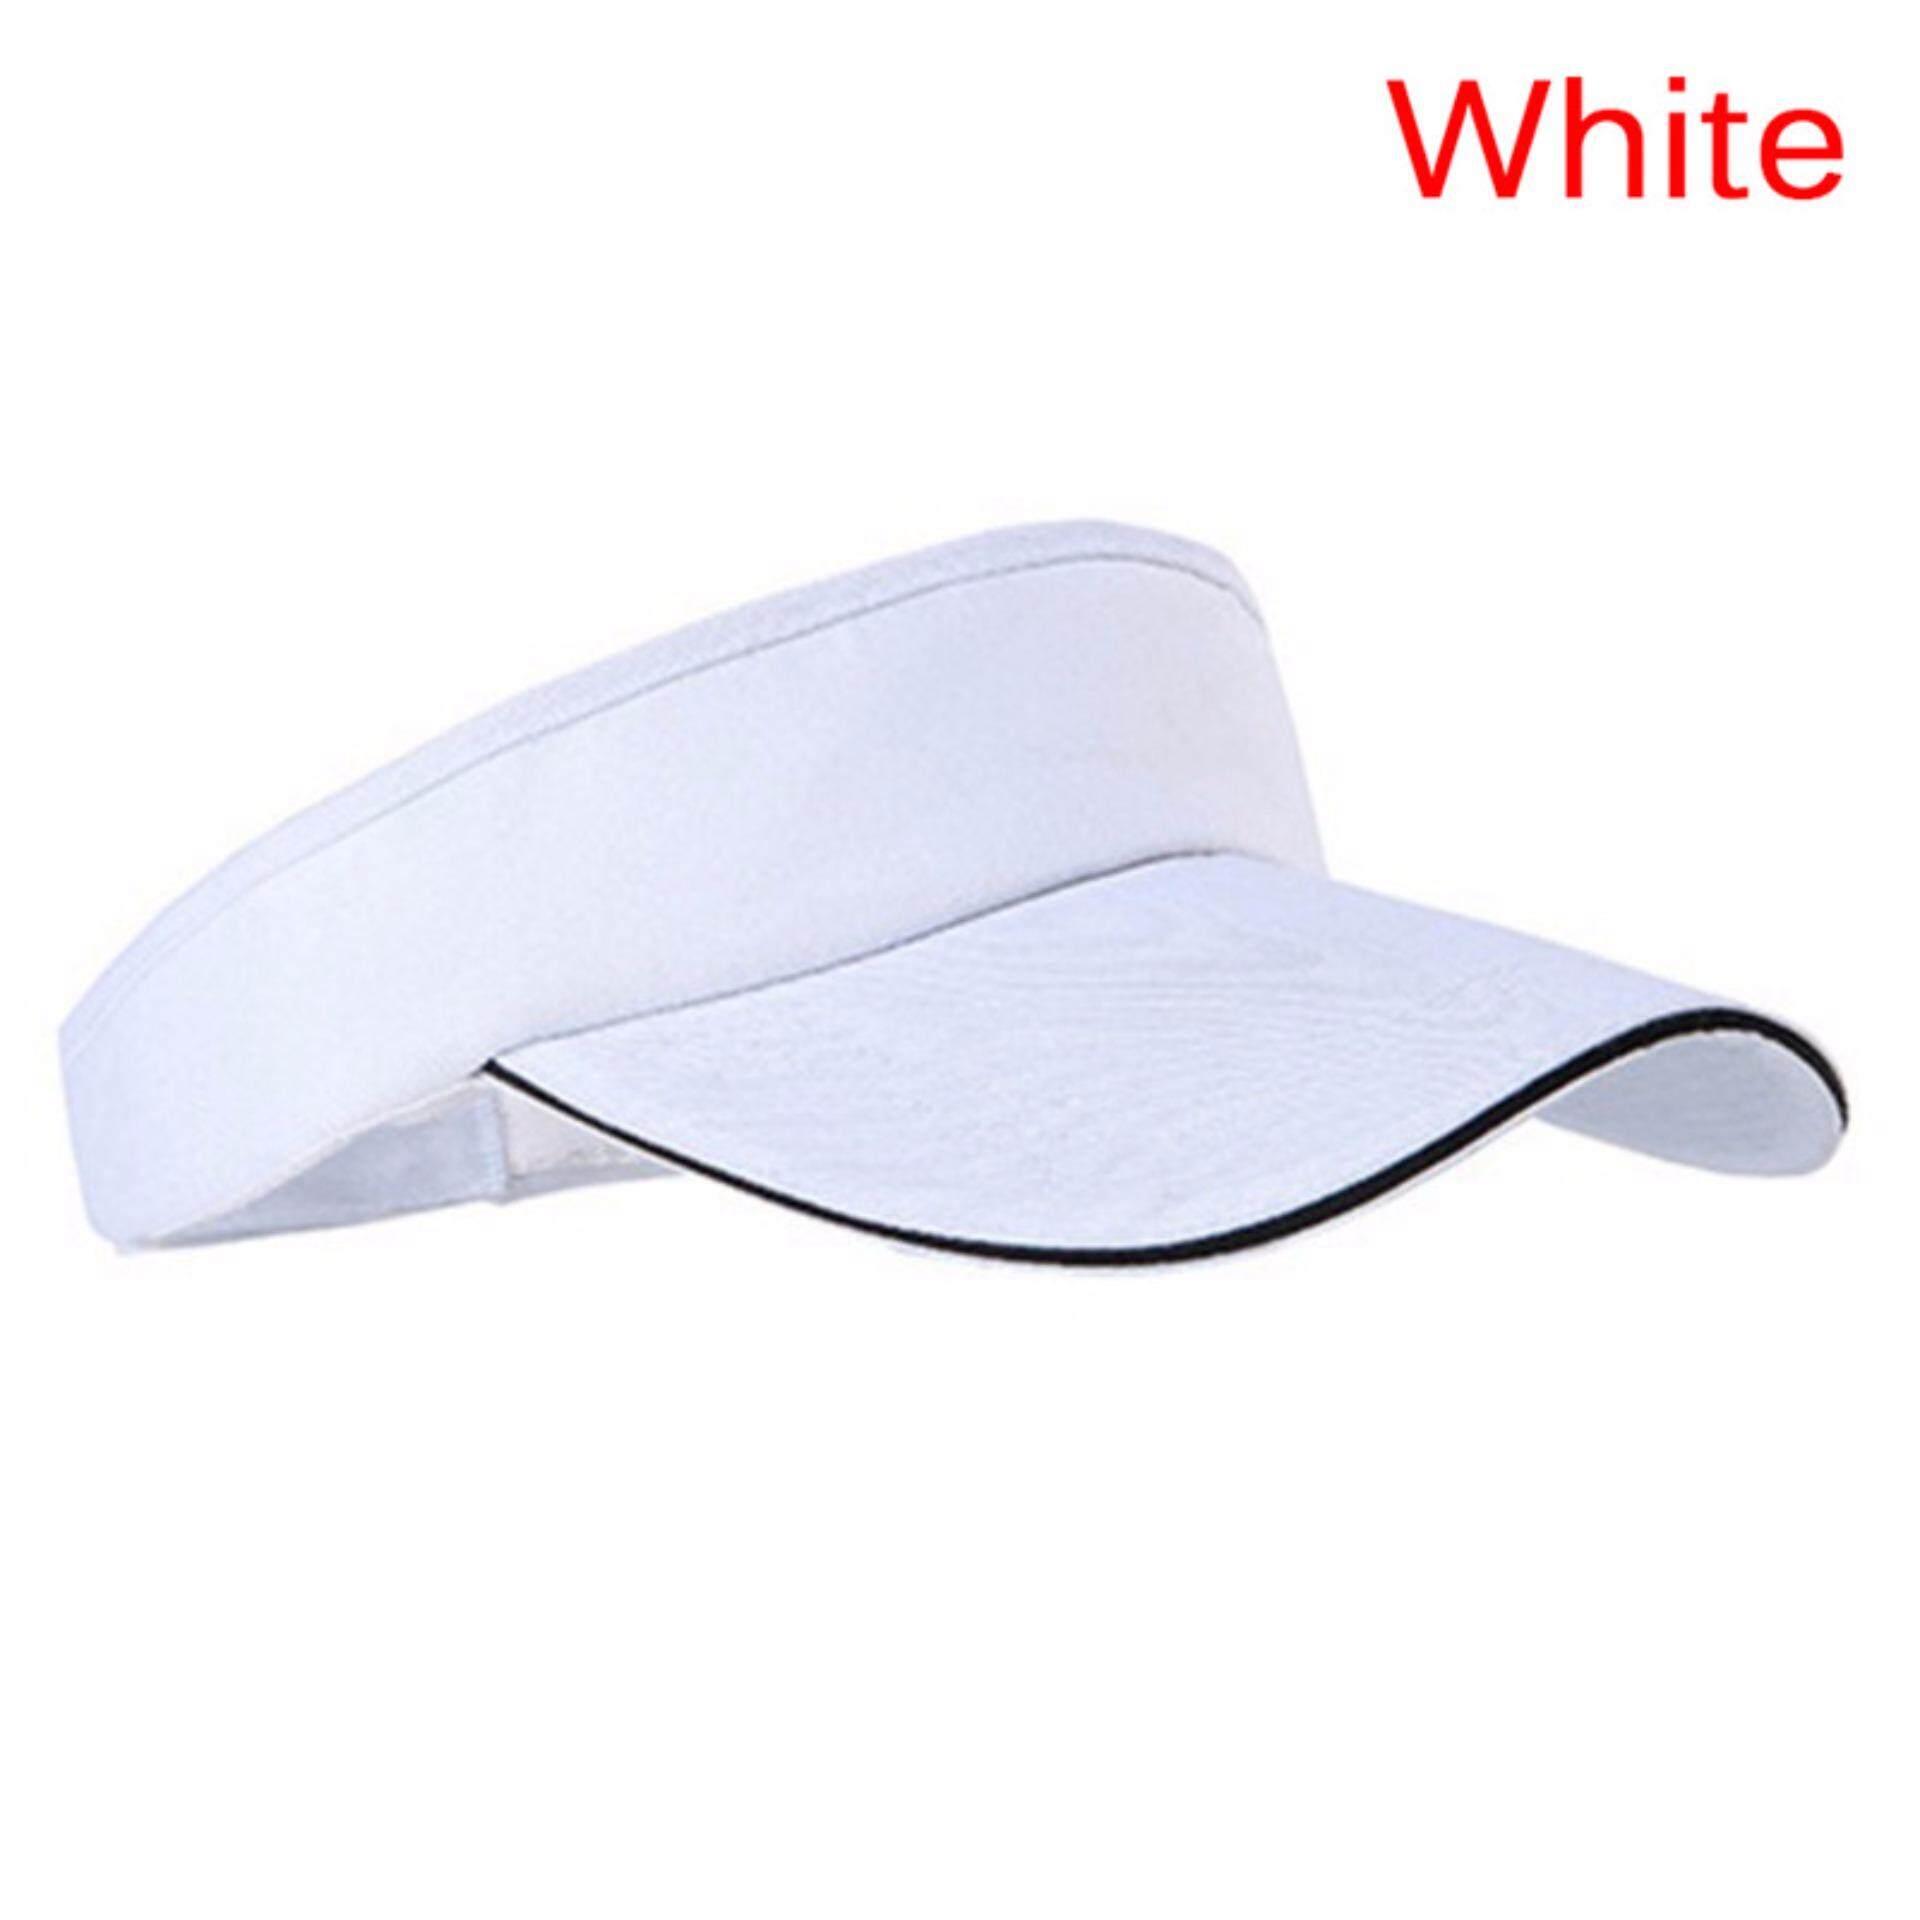 Adjustable Unisex Men Women Plain Sun Visor Sport Golf Tennis Breathable Cap  Hat e2045564a8cd